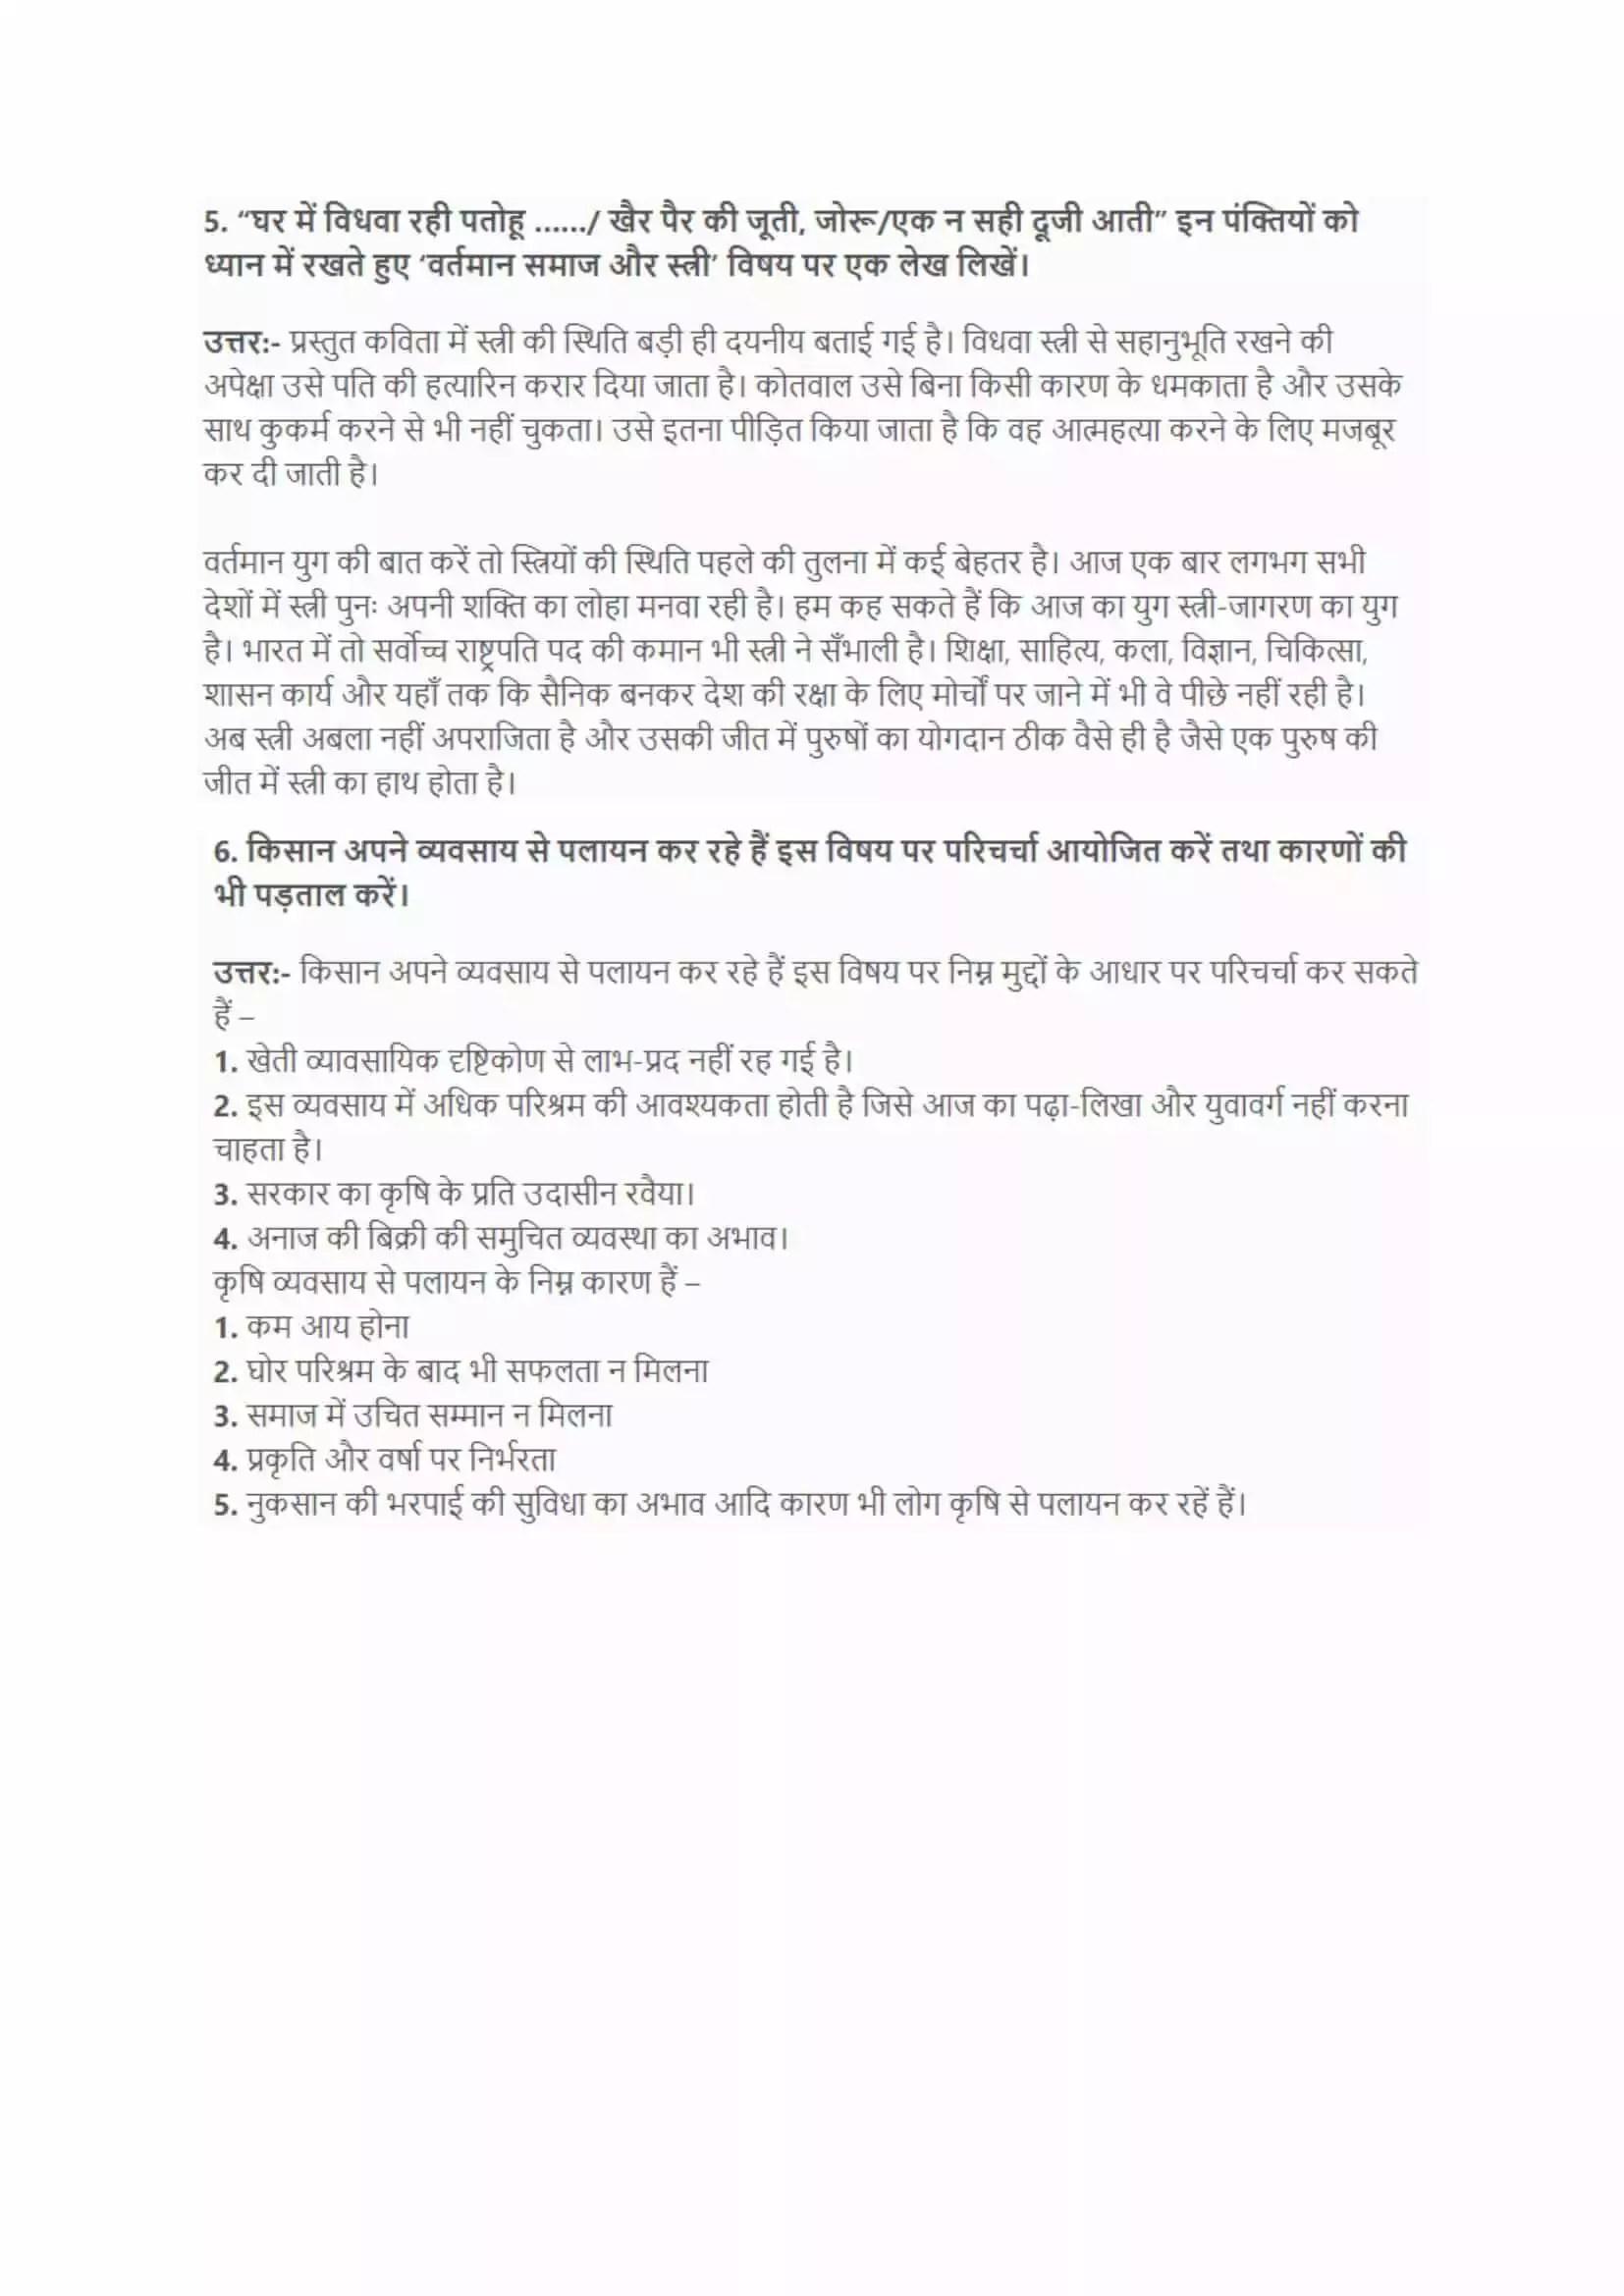 NCERT Solutions Class 11 Hindi Aroh Chapter 14 - वे आँखें